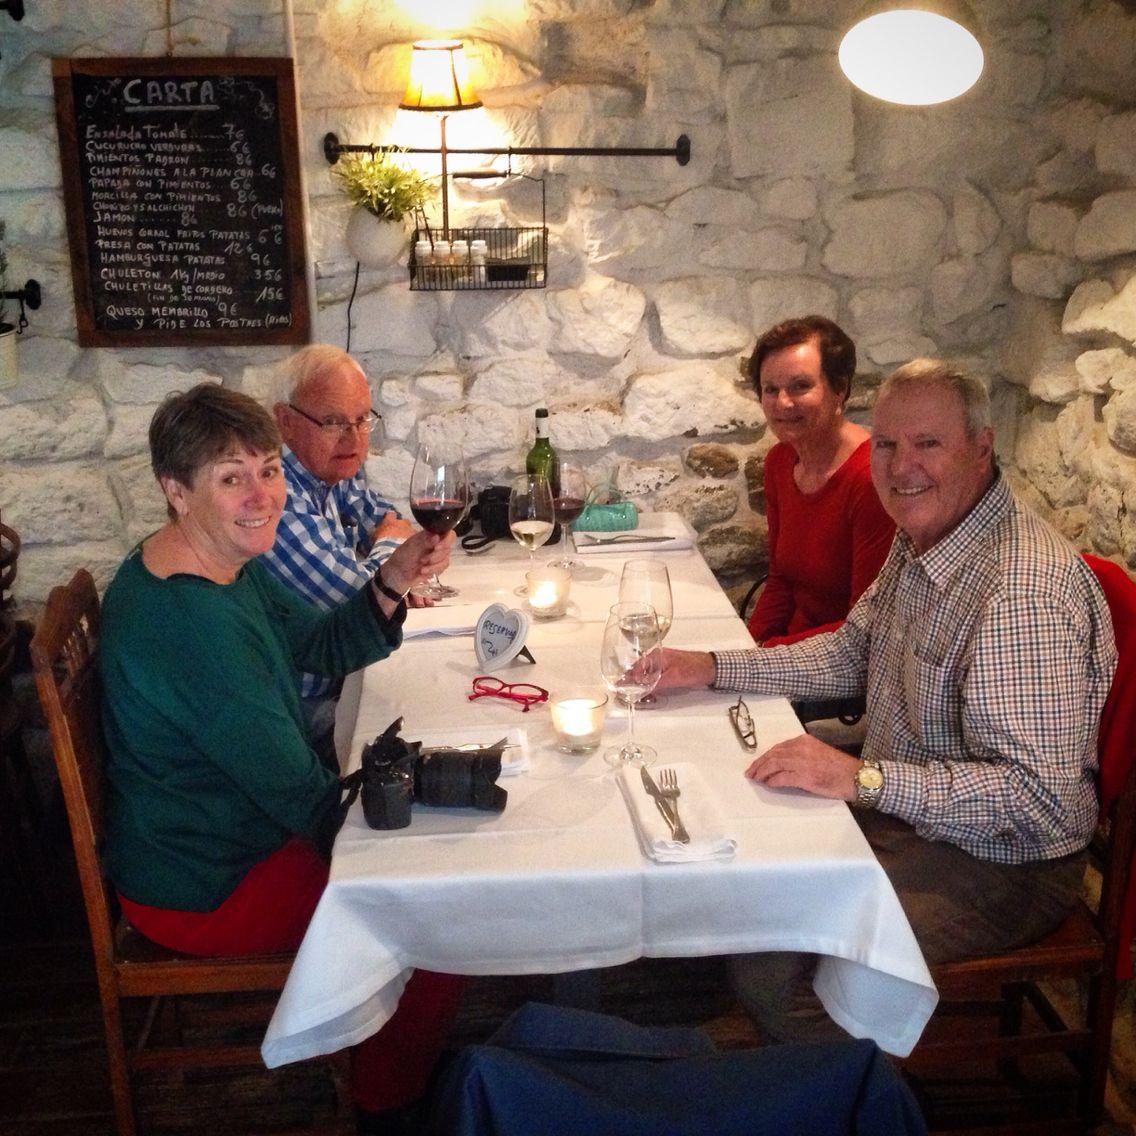 #cuevadelobos #laguardia #lariojaalavesa #basquetrips #wine #restaurants